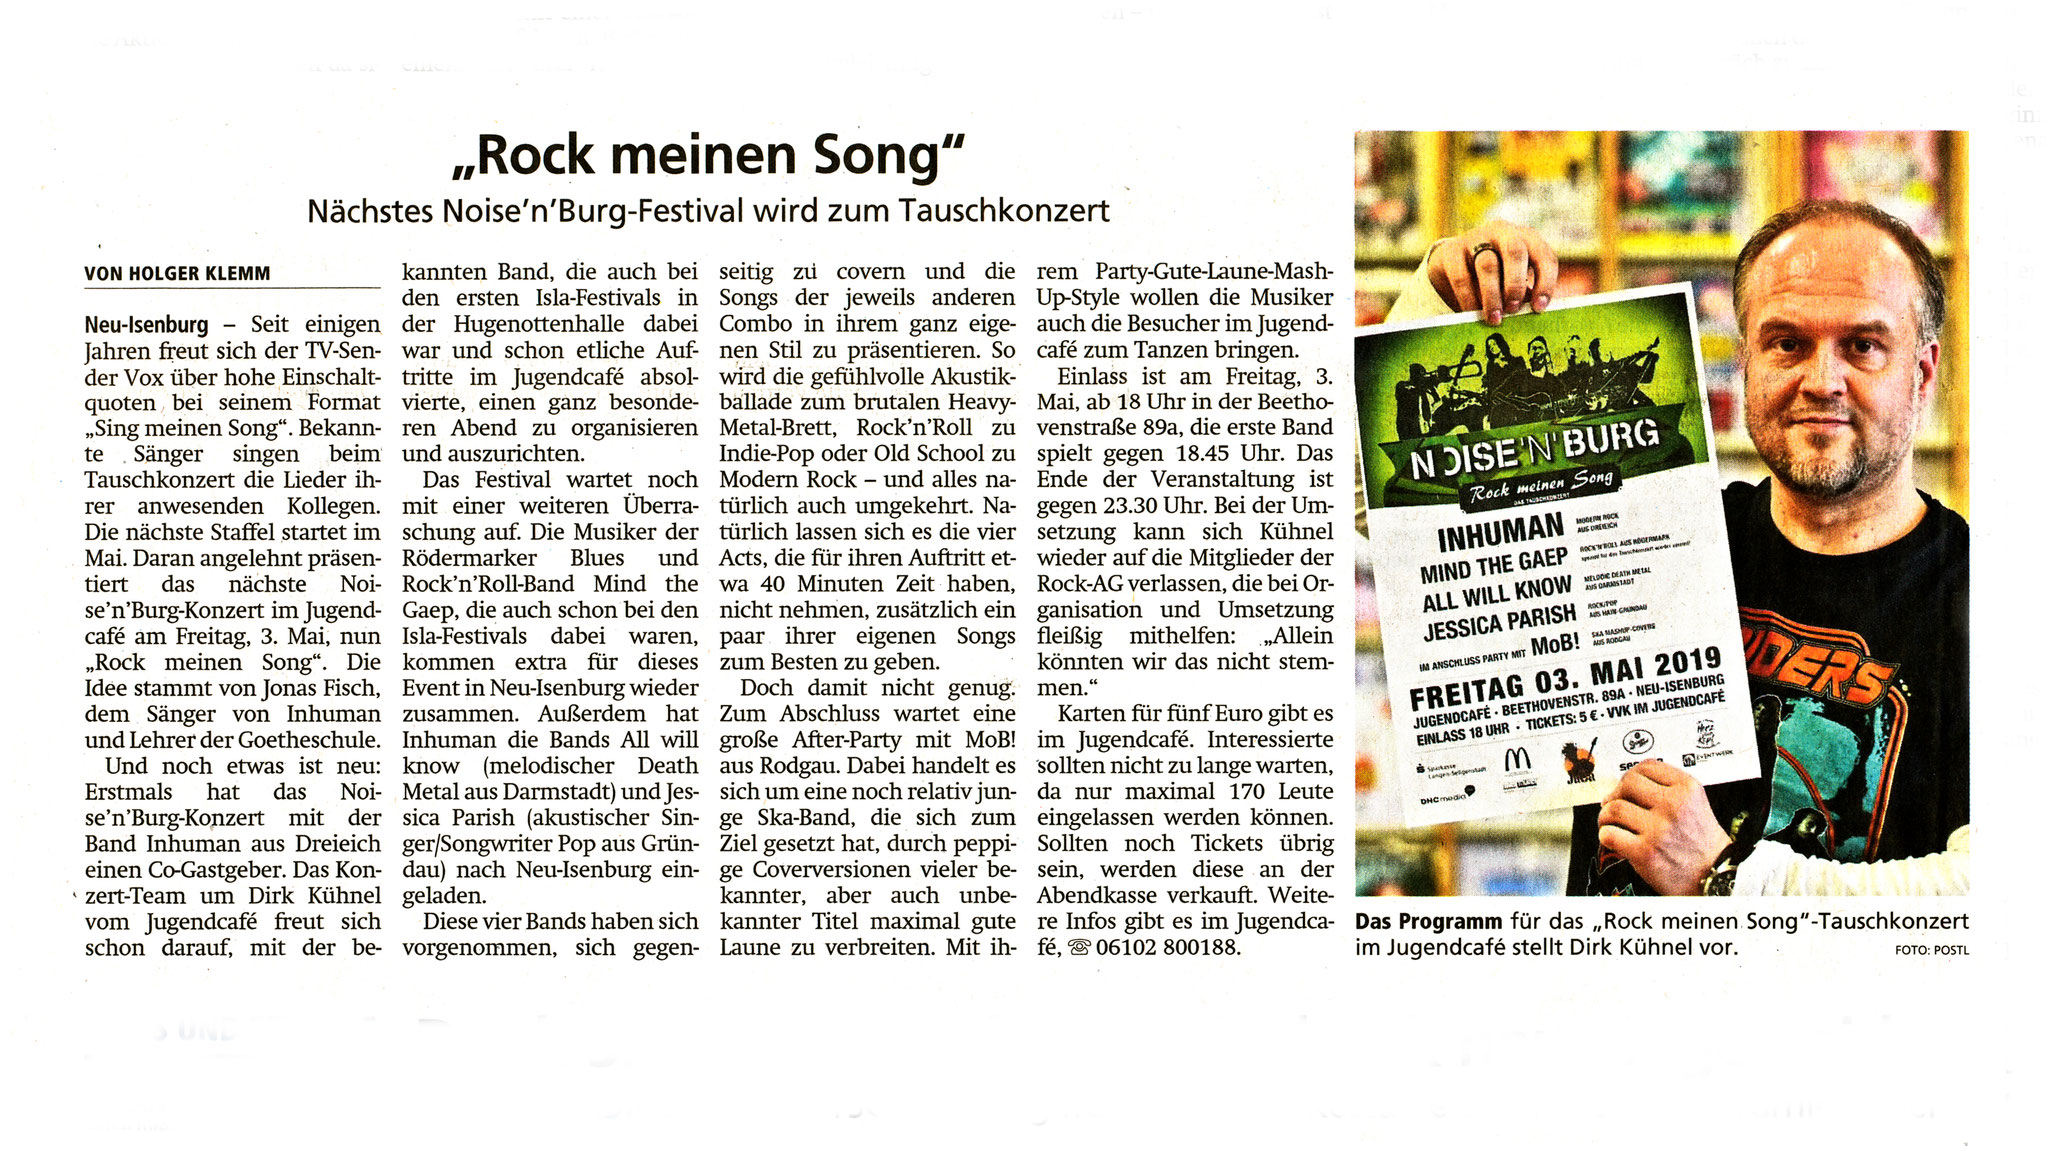 Offenbach Post, 16. April 2019